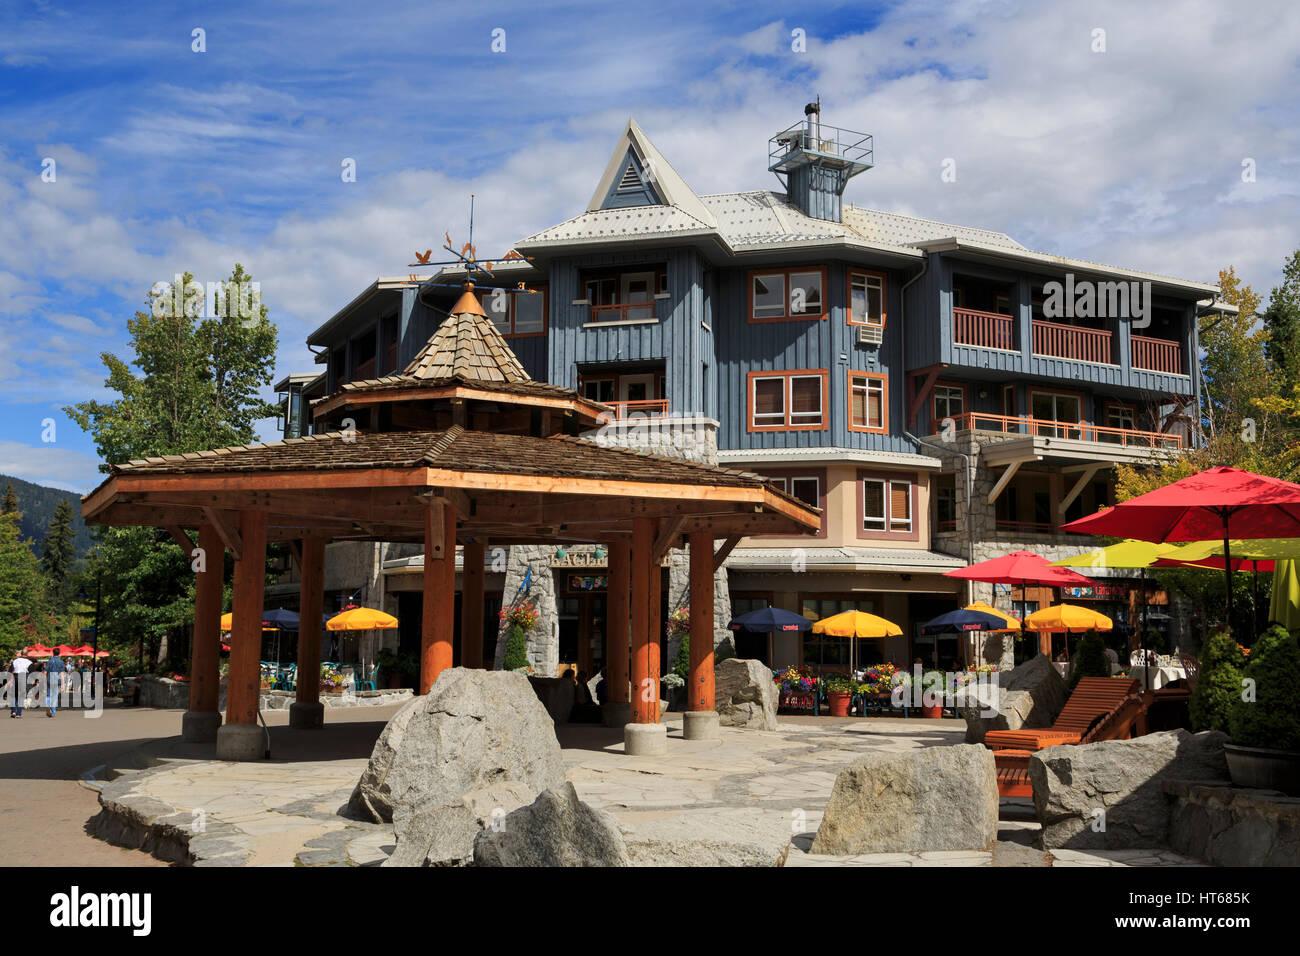 Whistler Village, British Columbia, Canada, North America - Stock Image